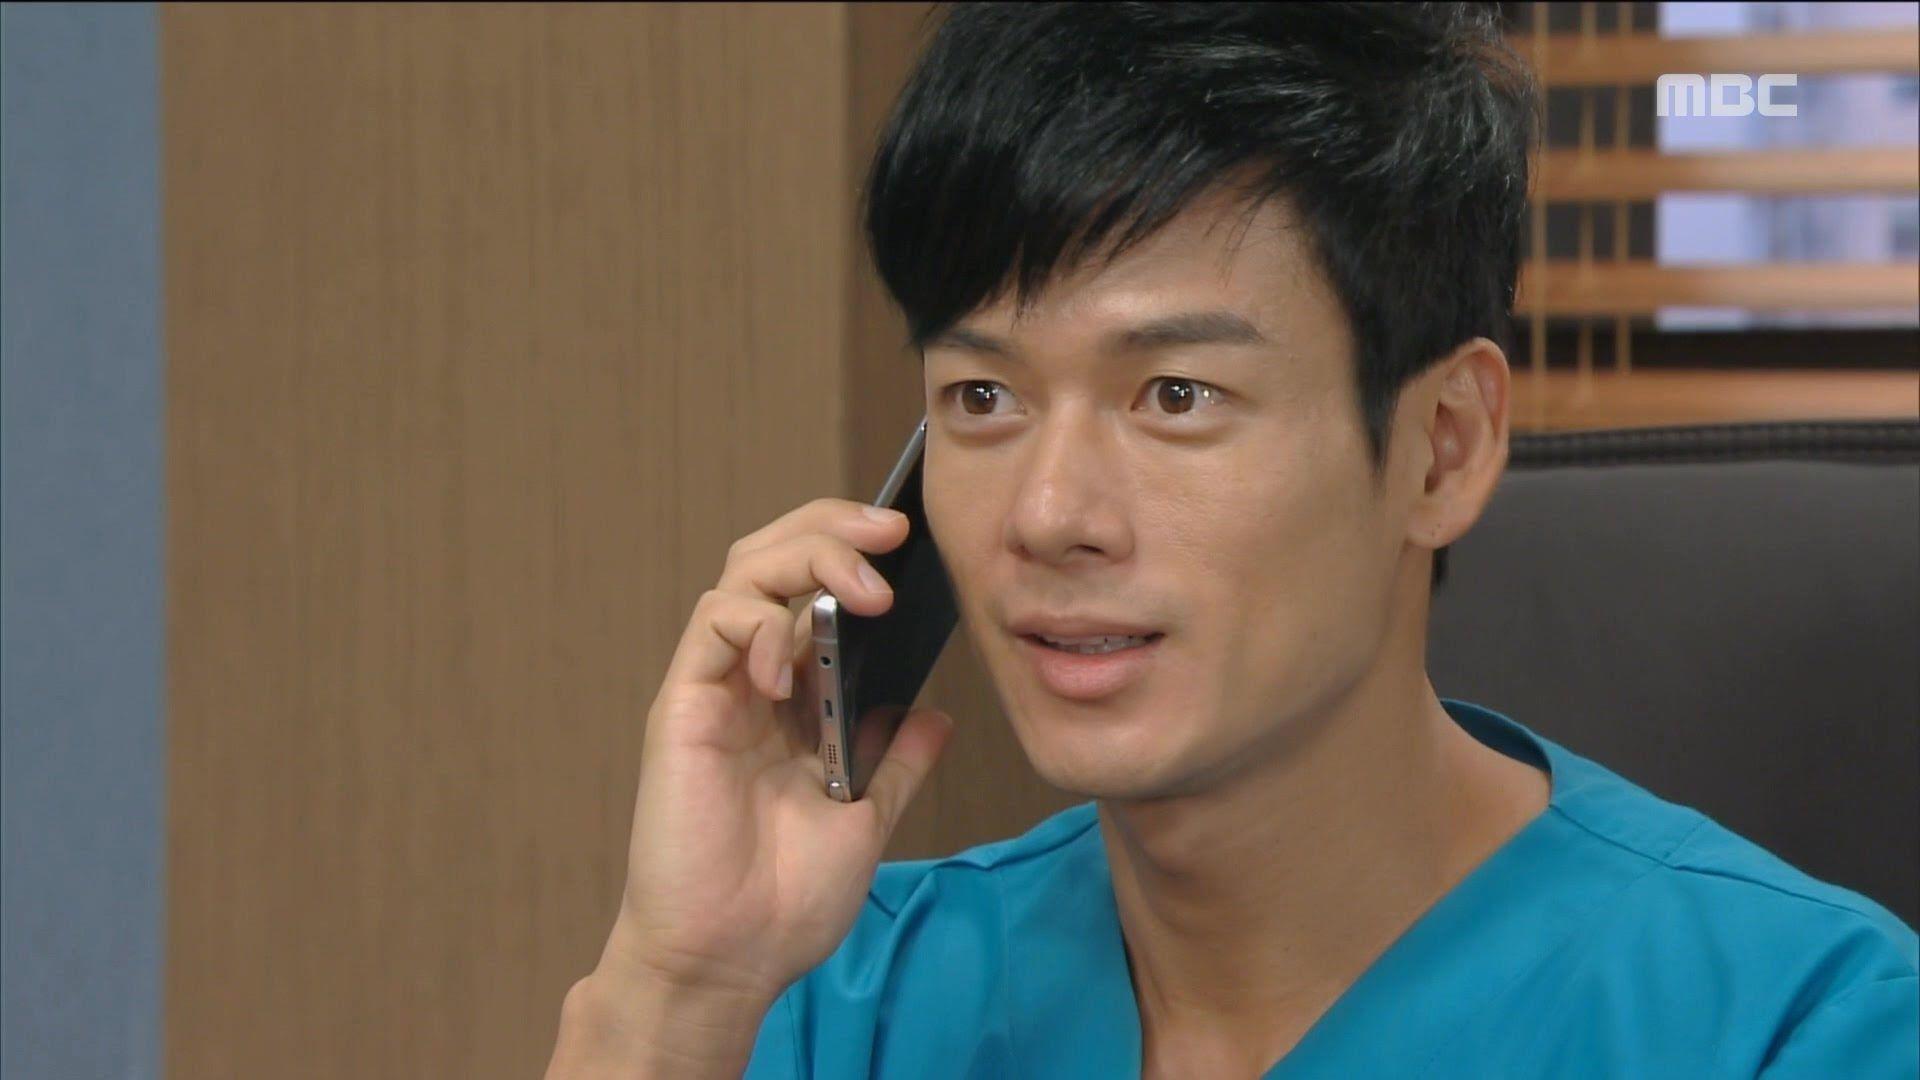 [A Daughter Just Like You] 딱 너 같은 딸 103회 - Kang Sung-Min, Meet a life sa...